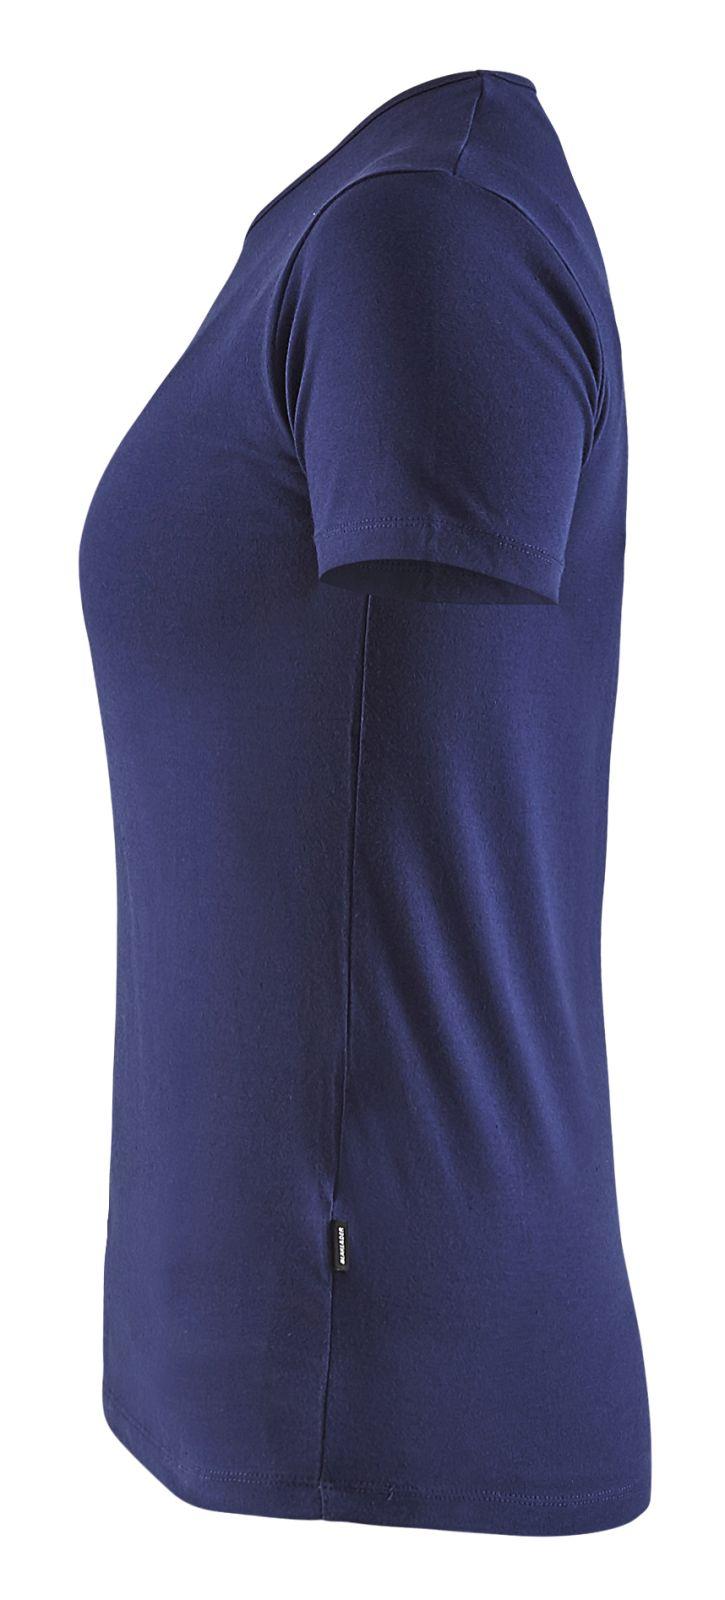 Blaklader Dames T-shirts 33041031 marineblauw(8800)